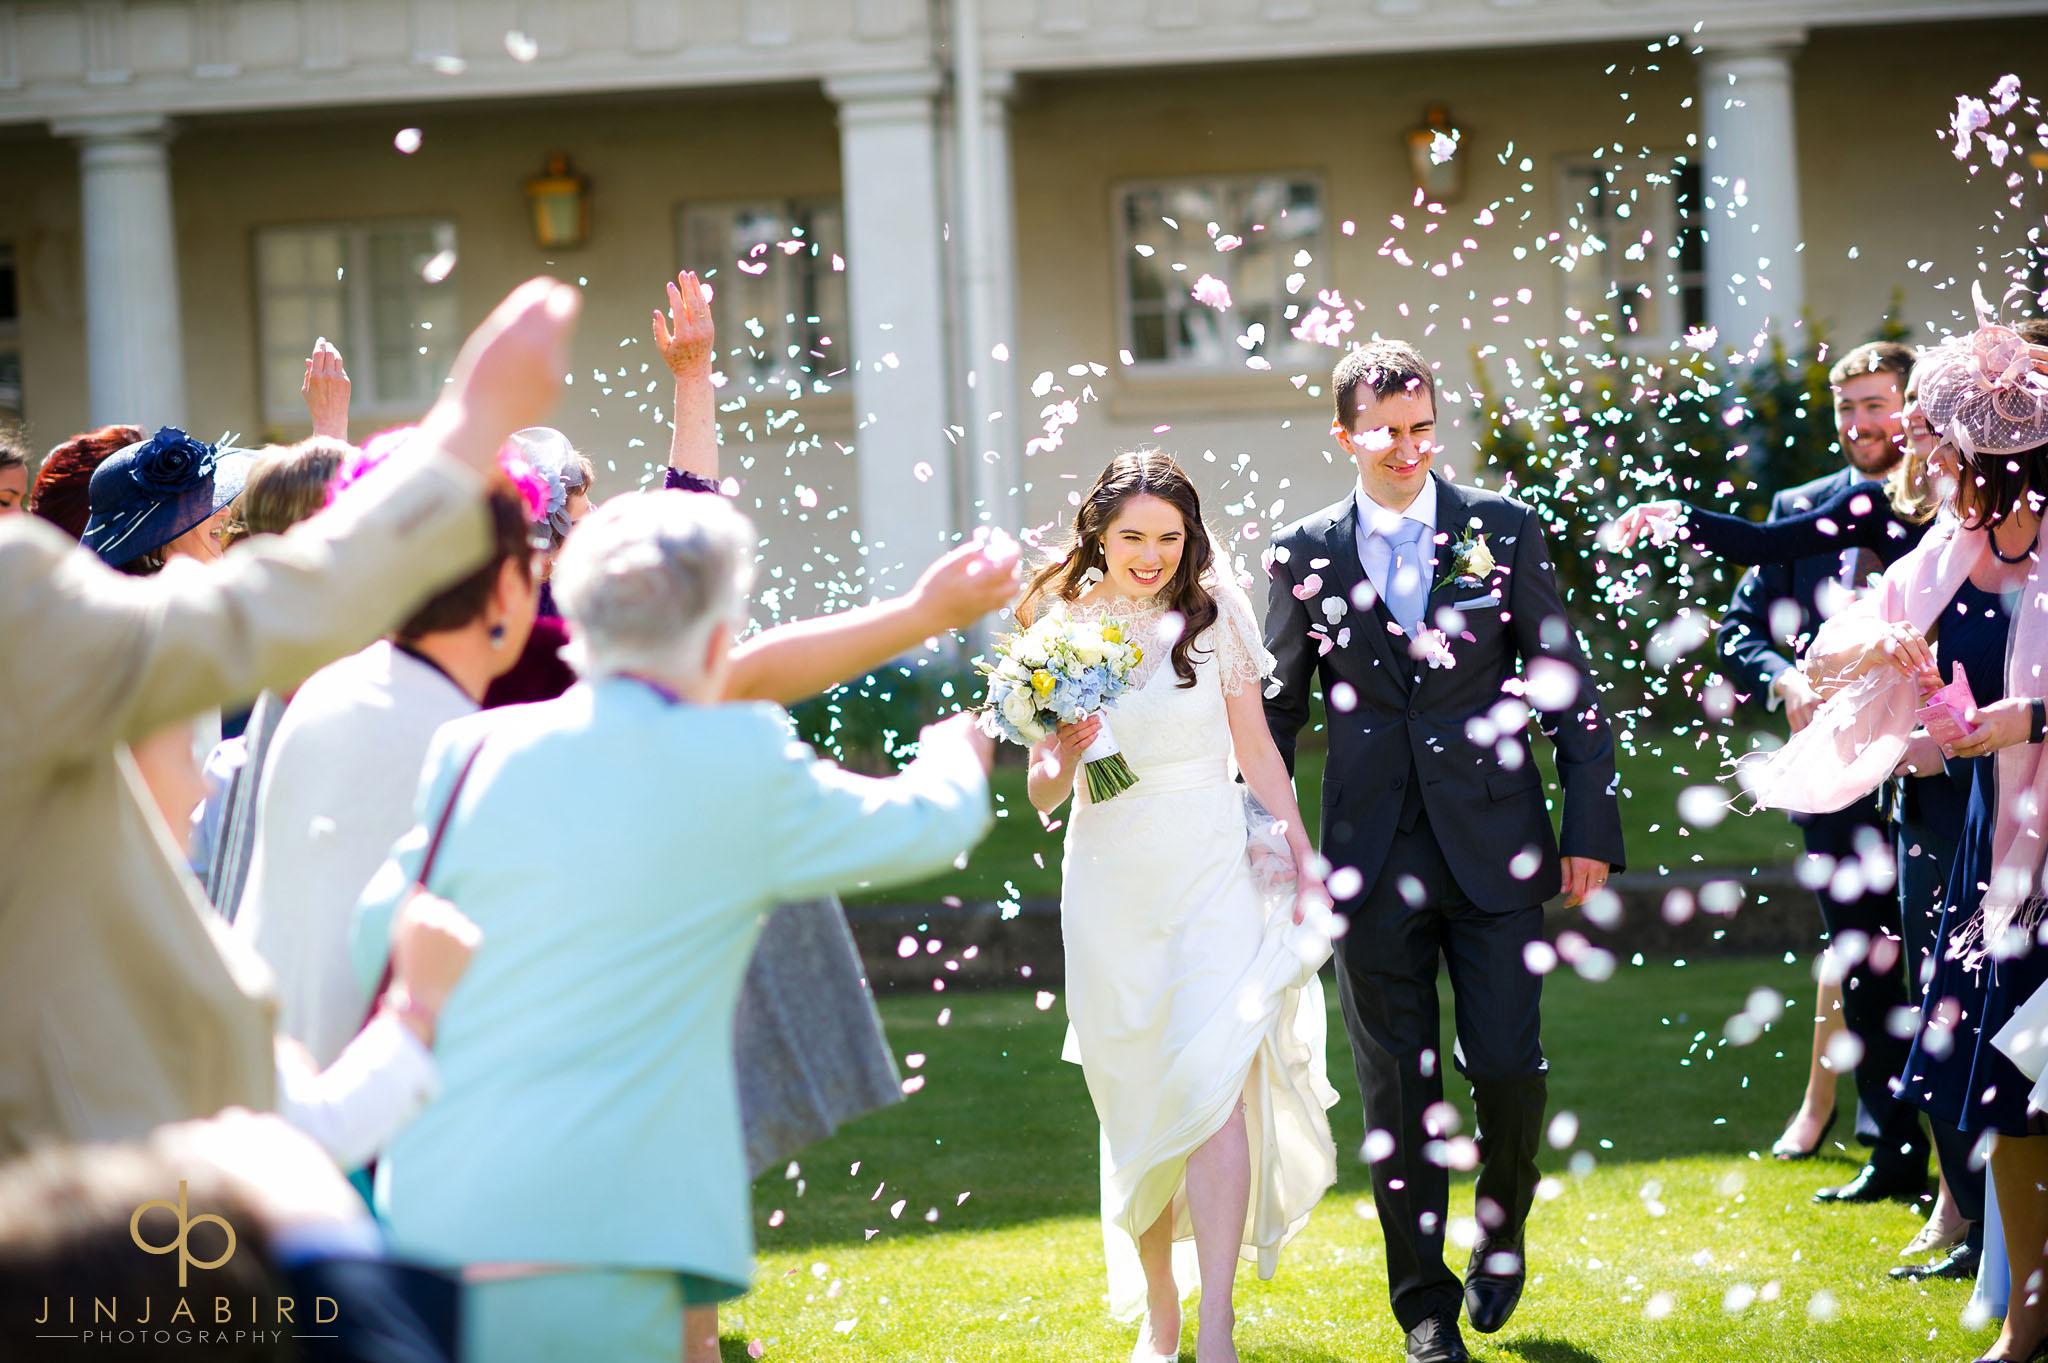 downing college wedding confetti